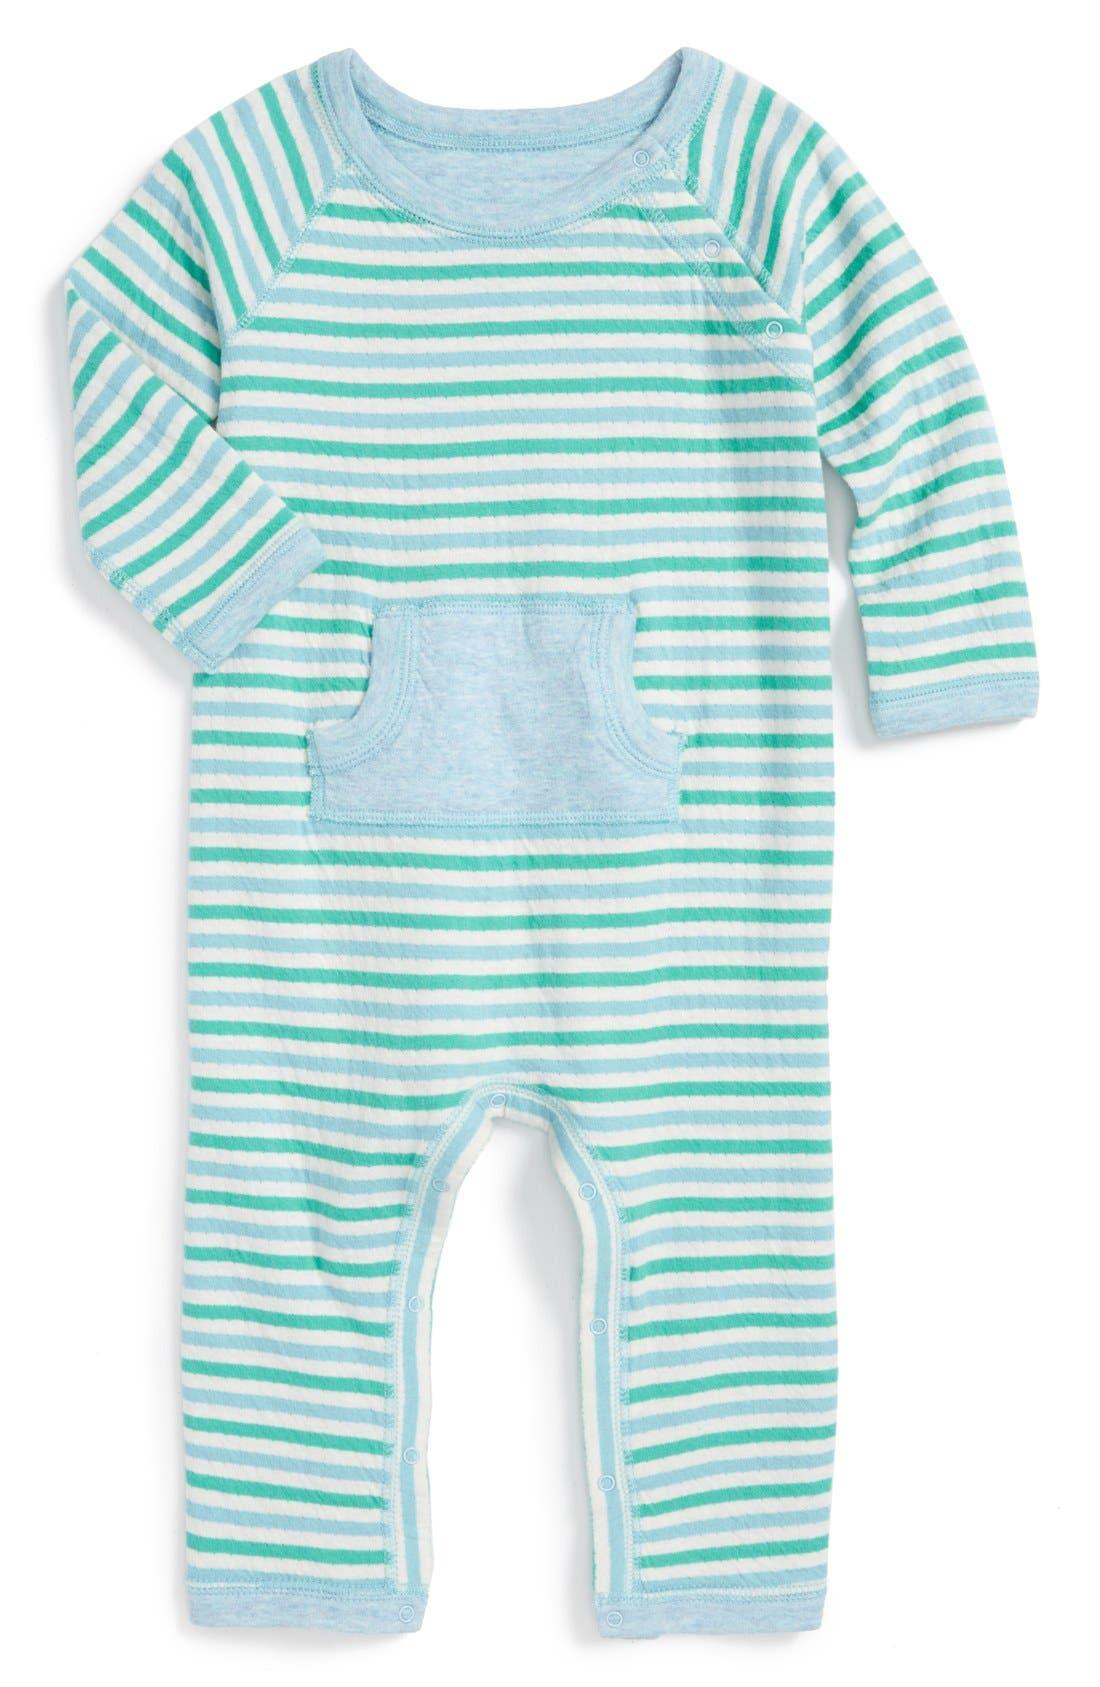 STEM BABY Reversible Organic Cotton Romper, Main, color, 450